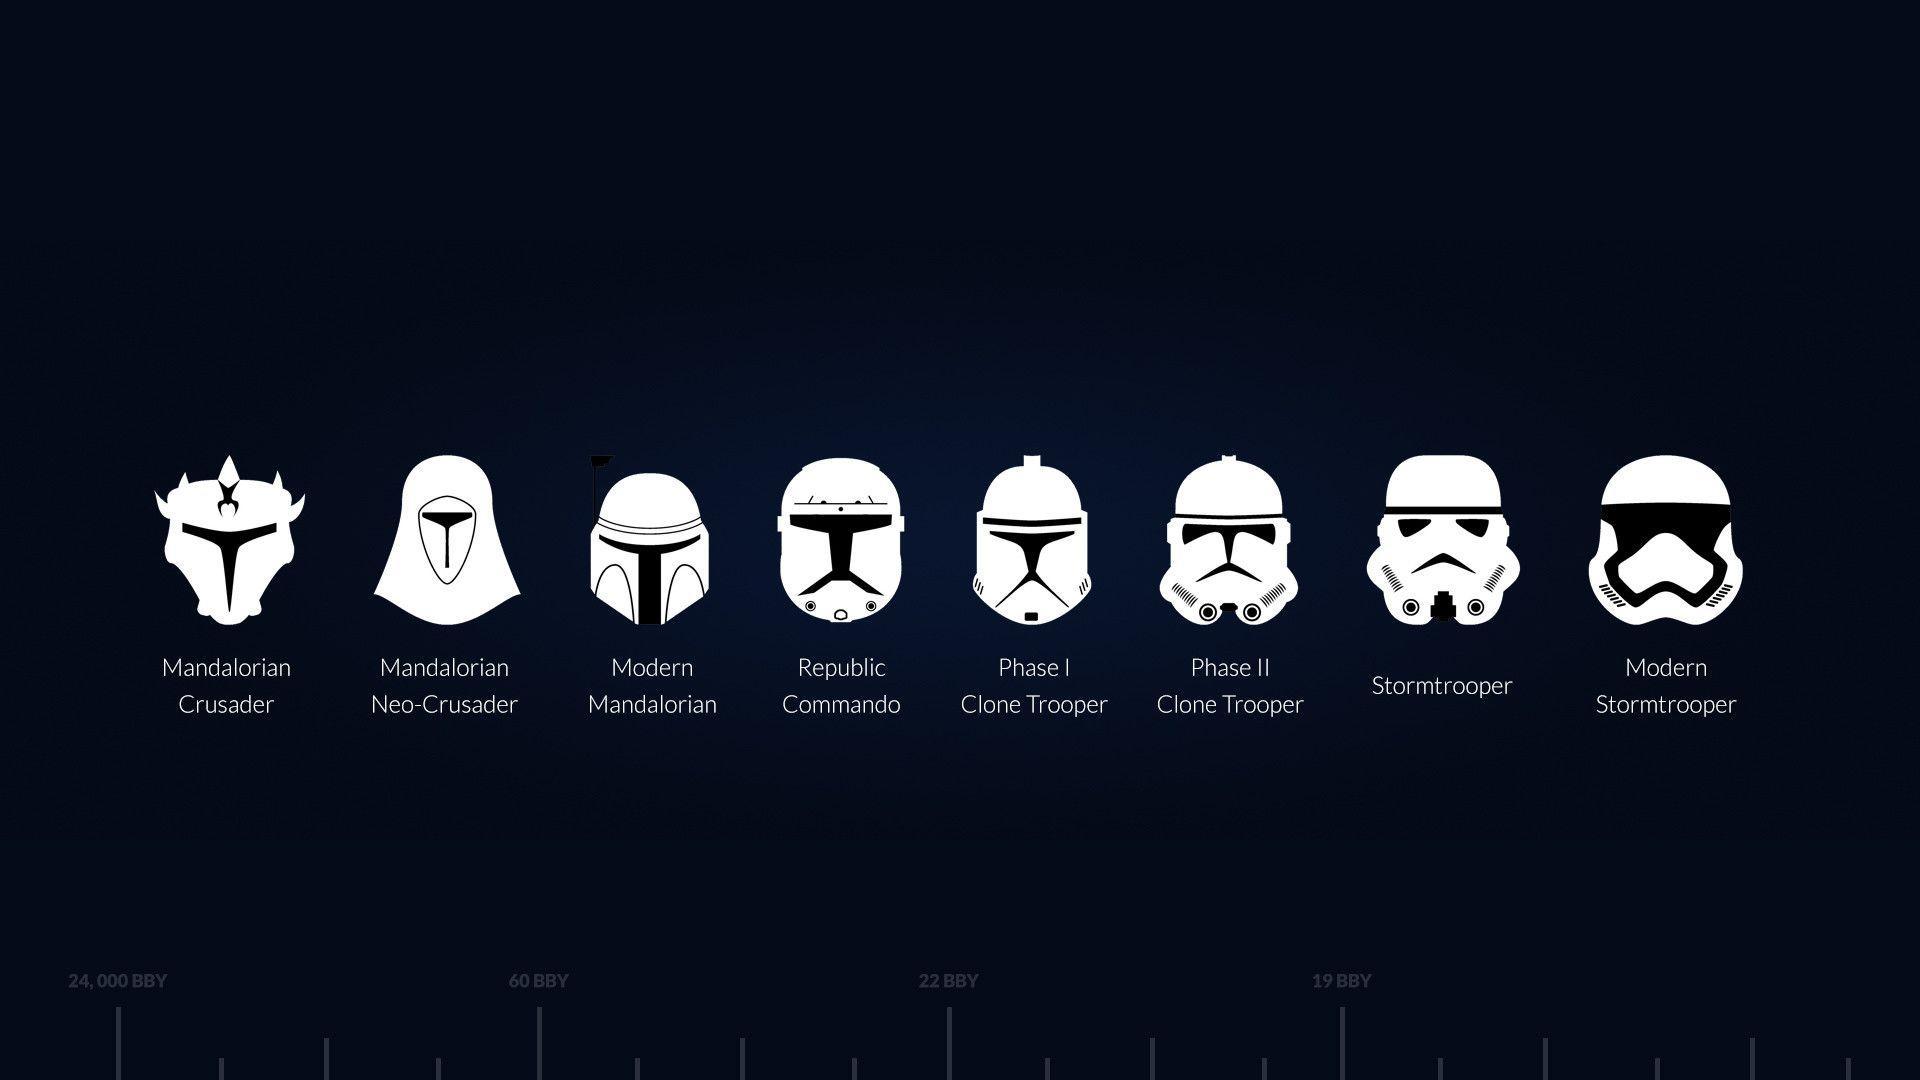 Star Wars Stormtrooper Wallpaper Kolpaper Awesome Free Hd Wallpapers